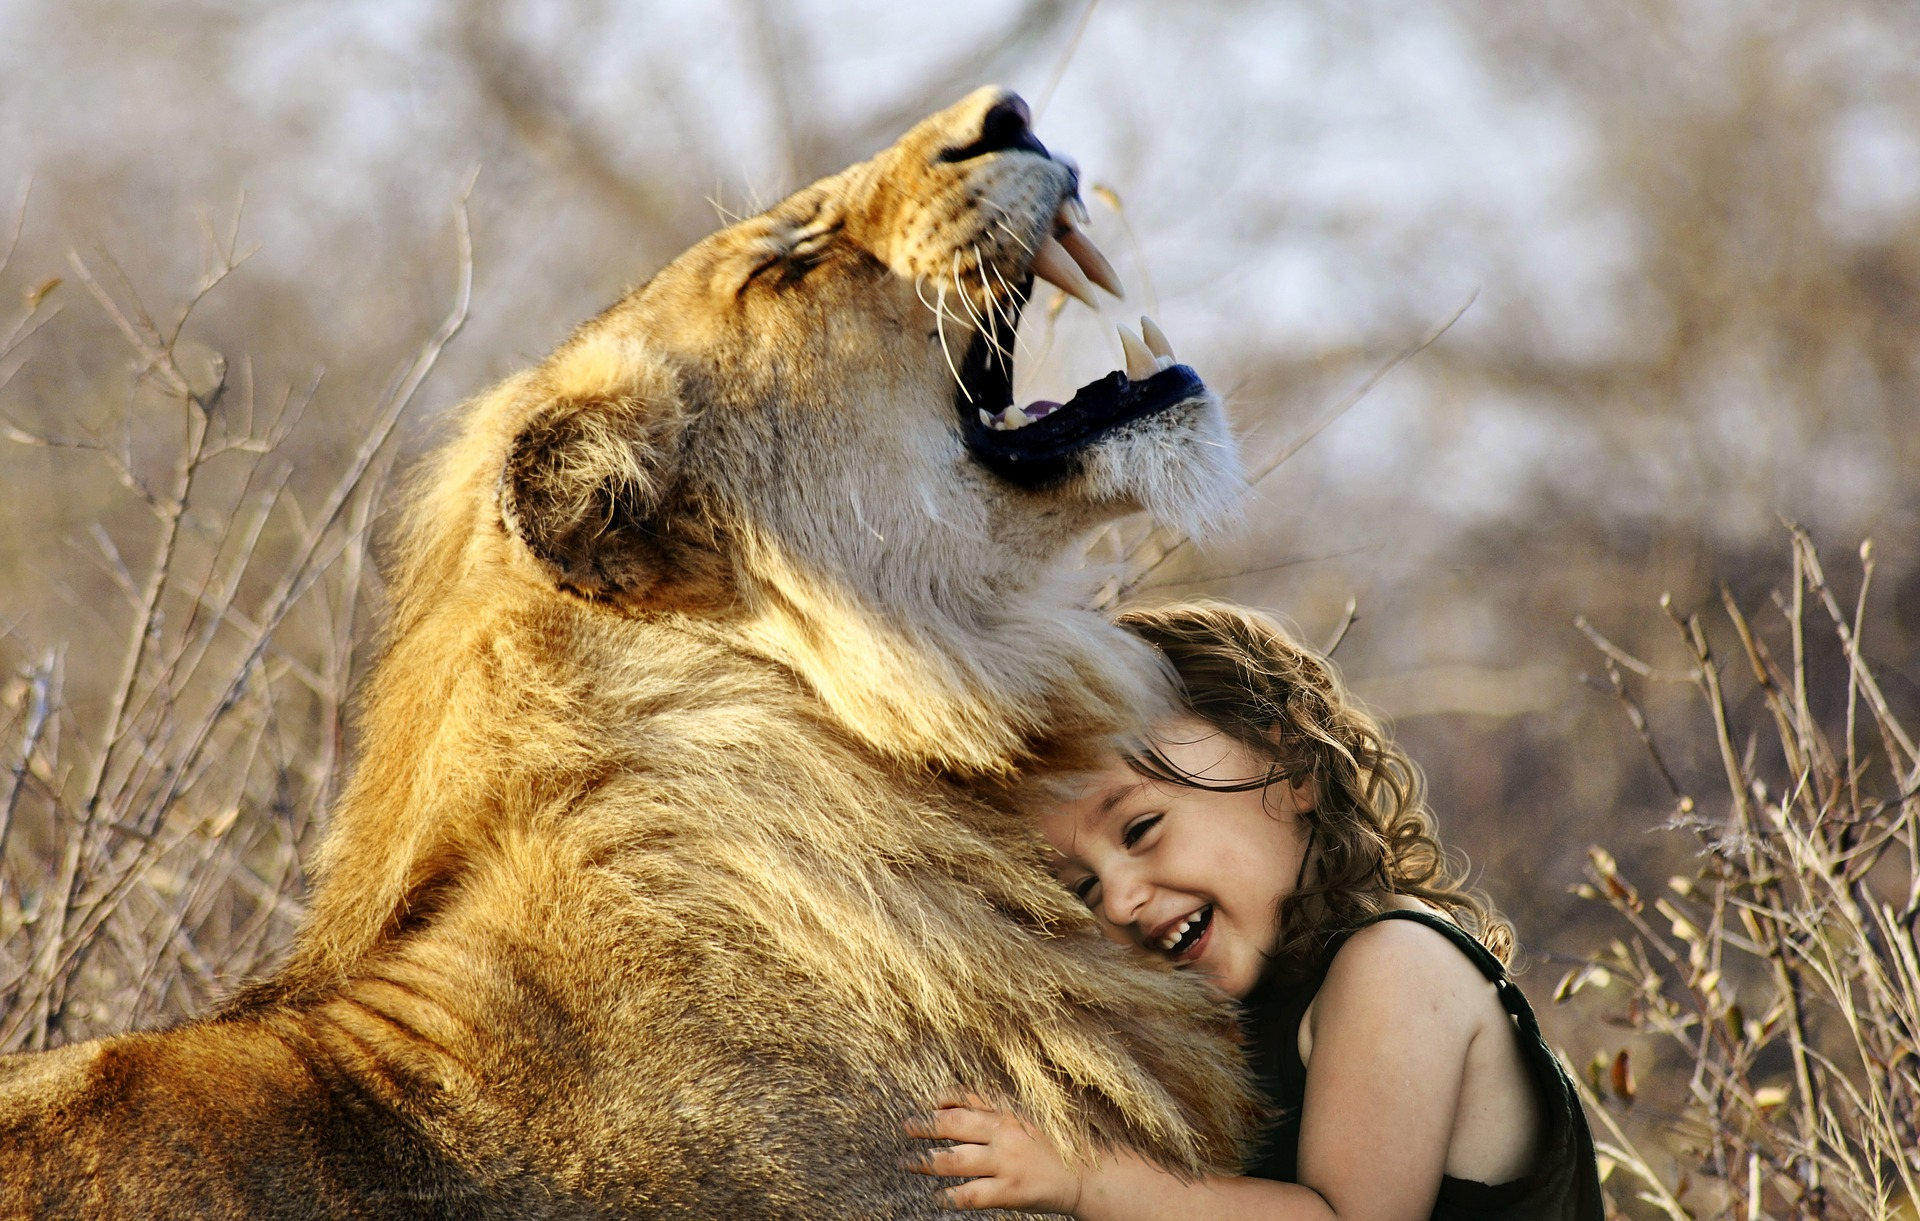 lion-Fatherheart - France